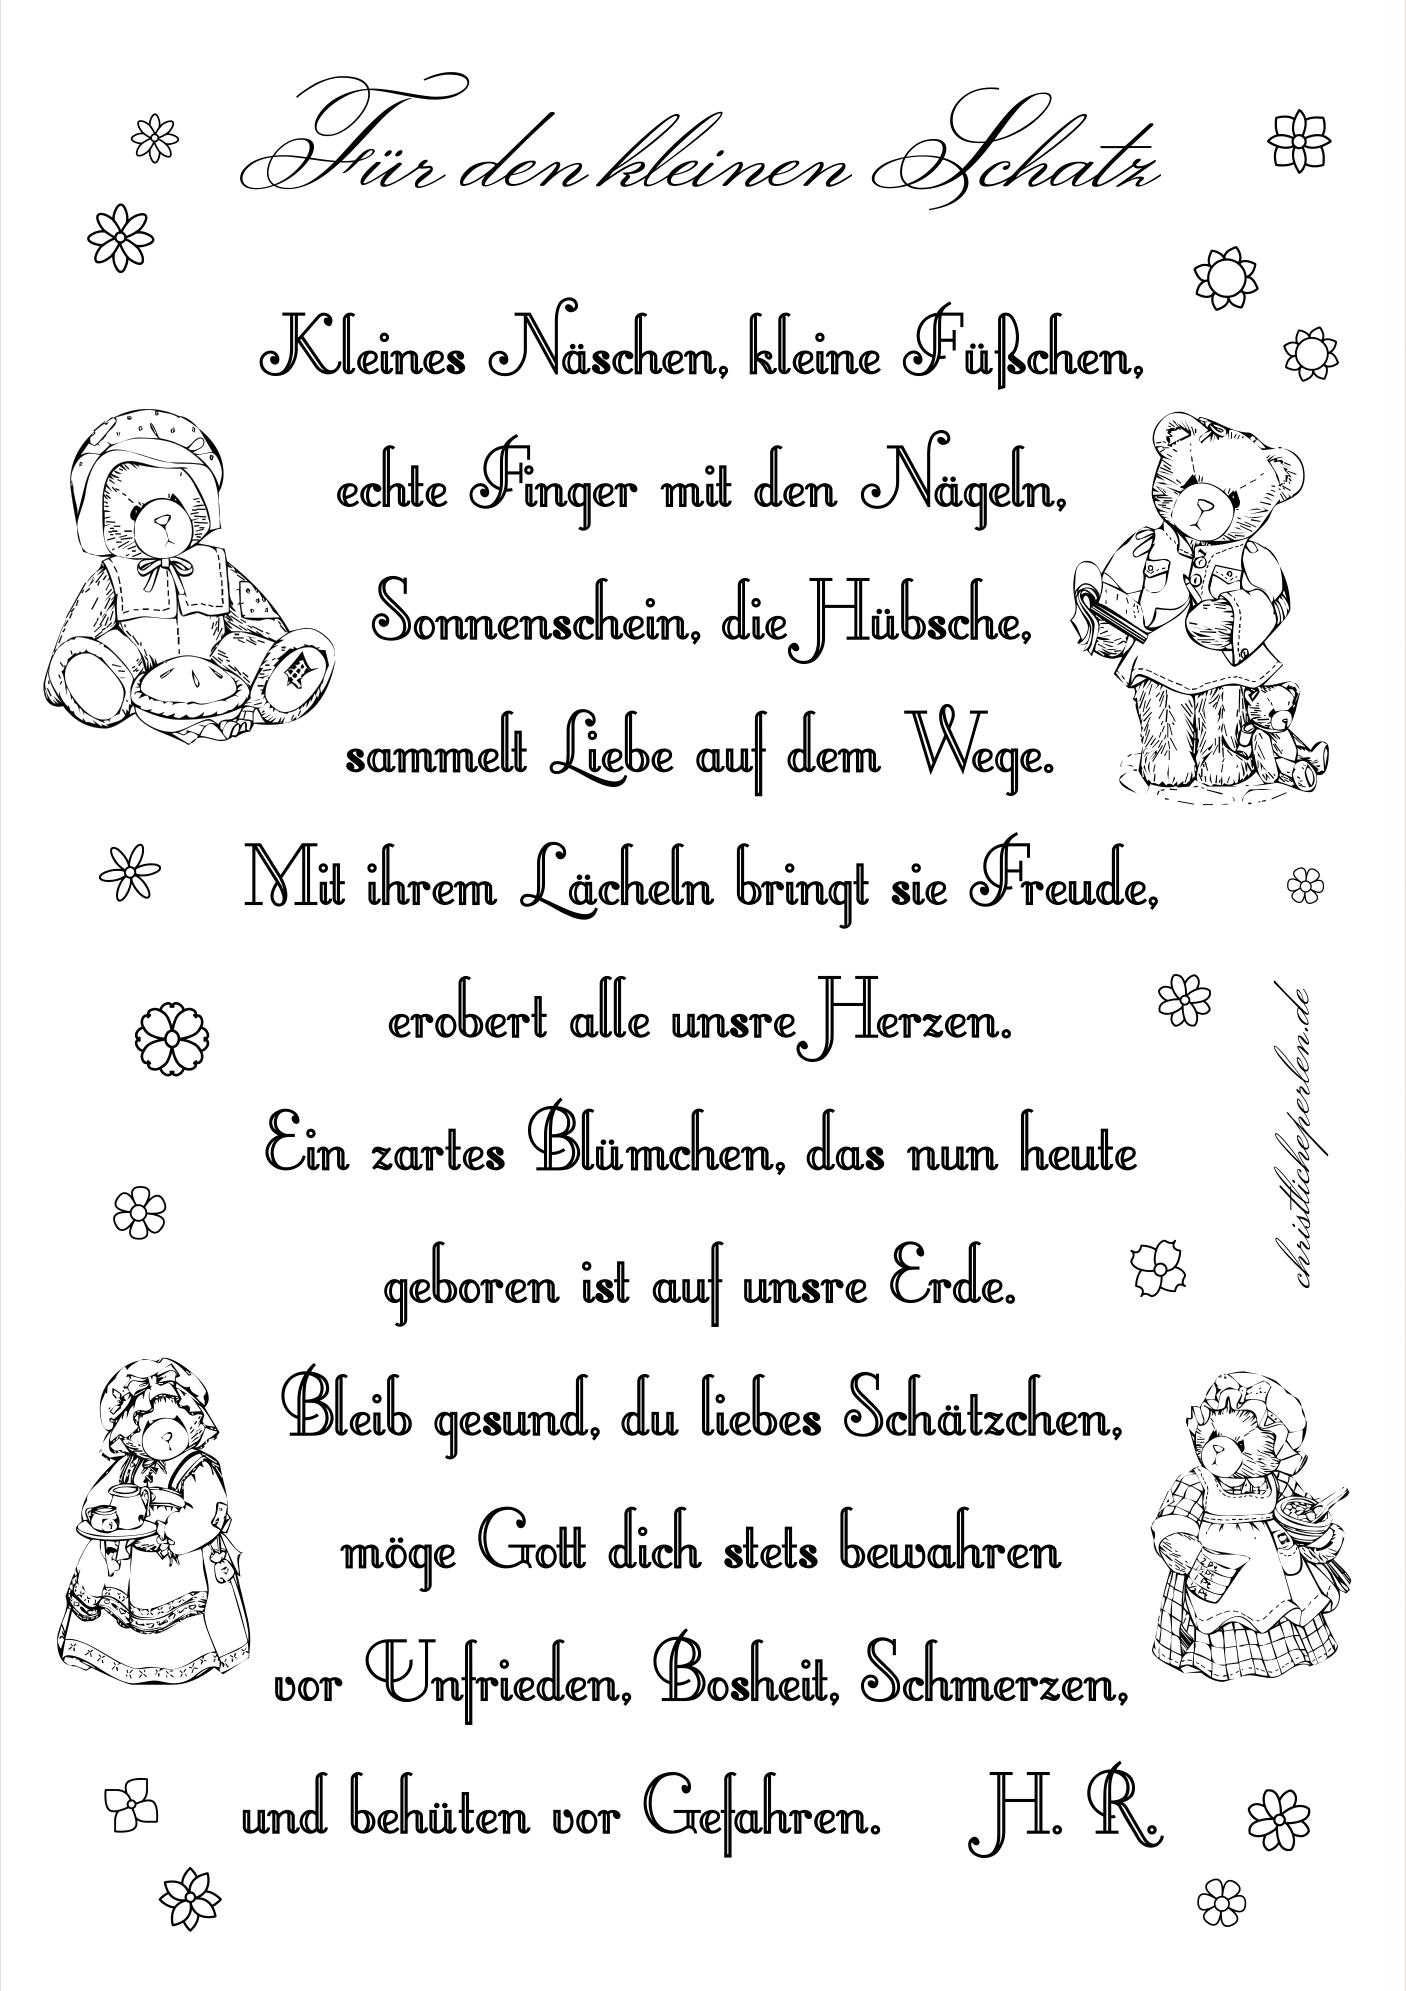 Gedicht zum 18 geburtstag sohn